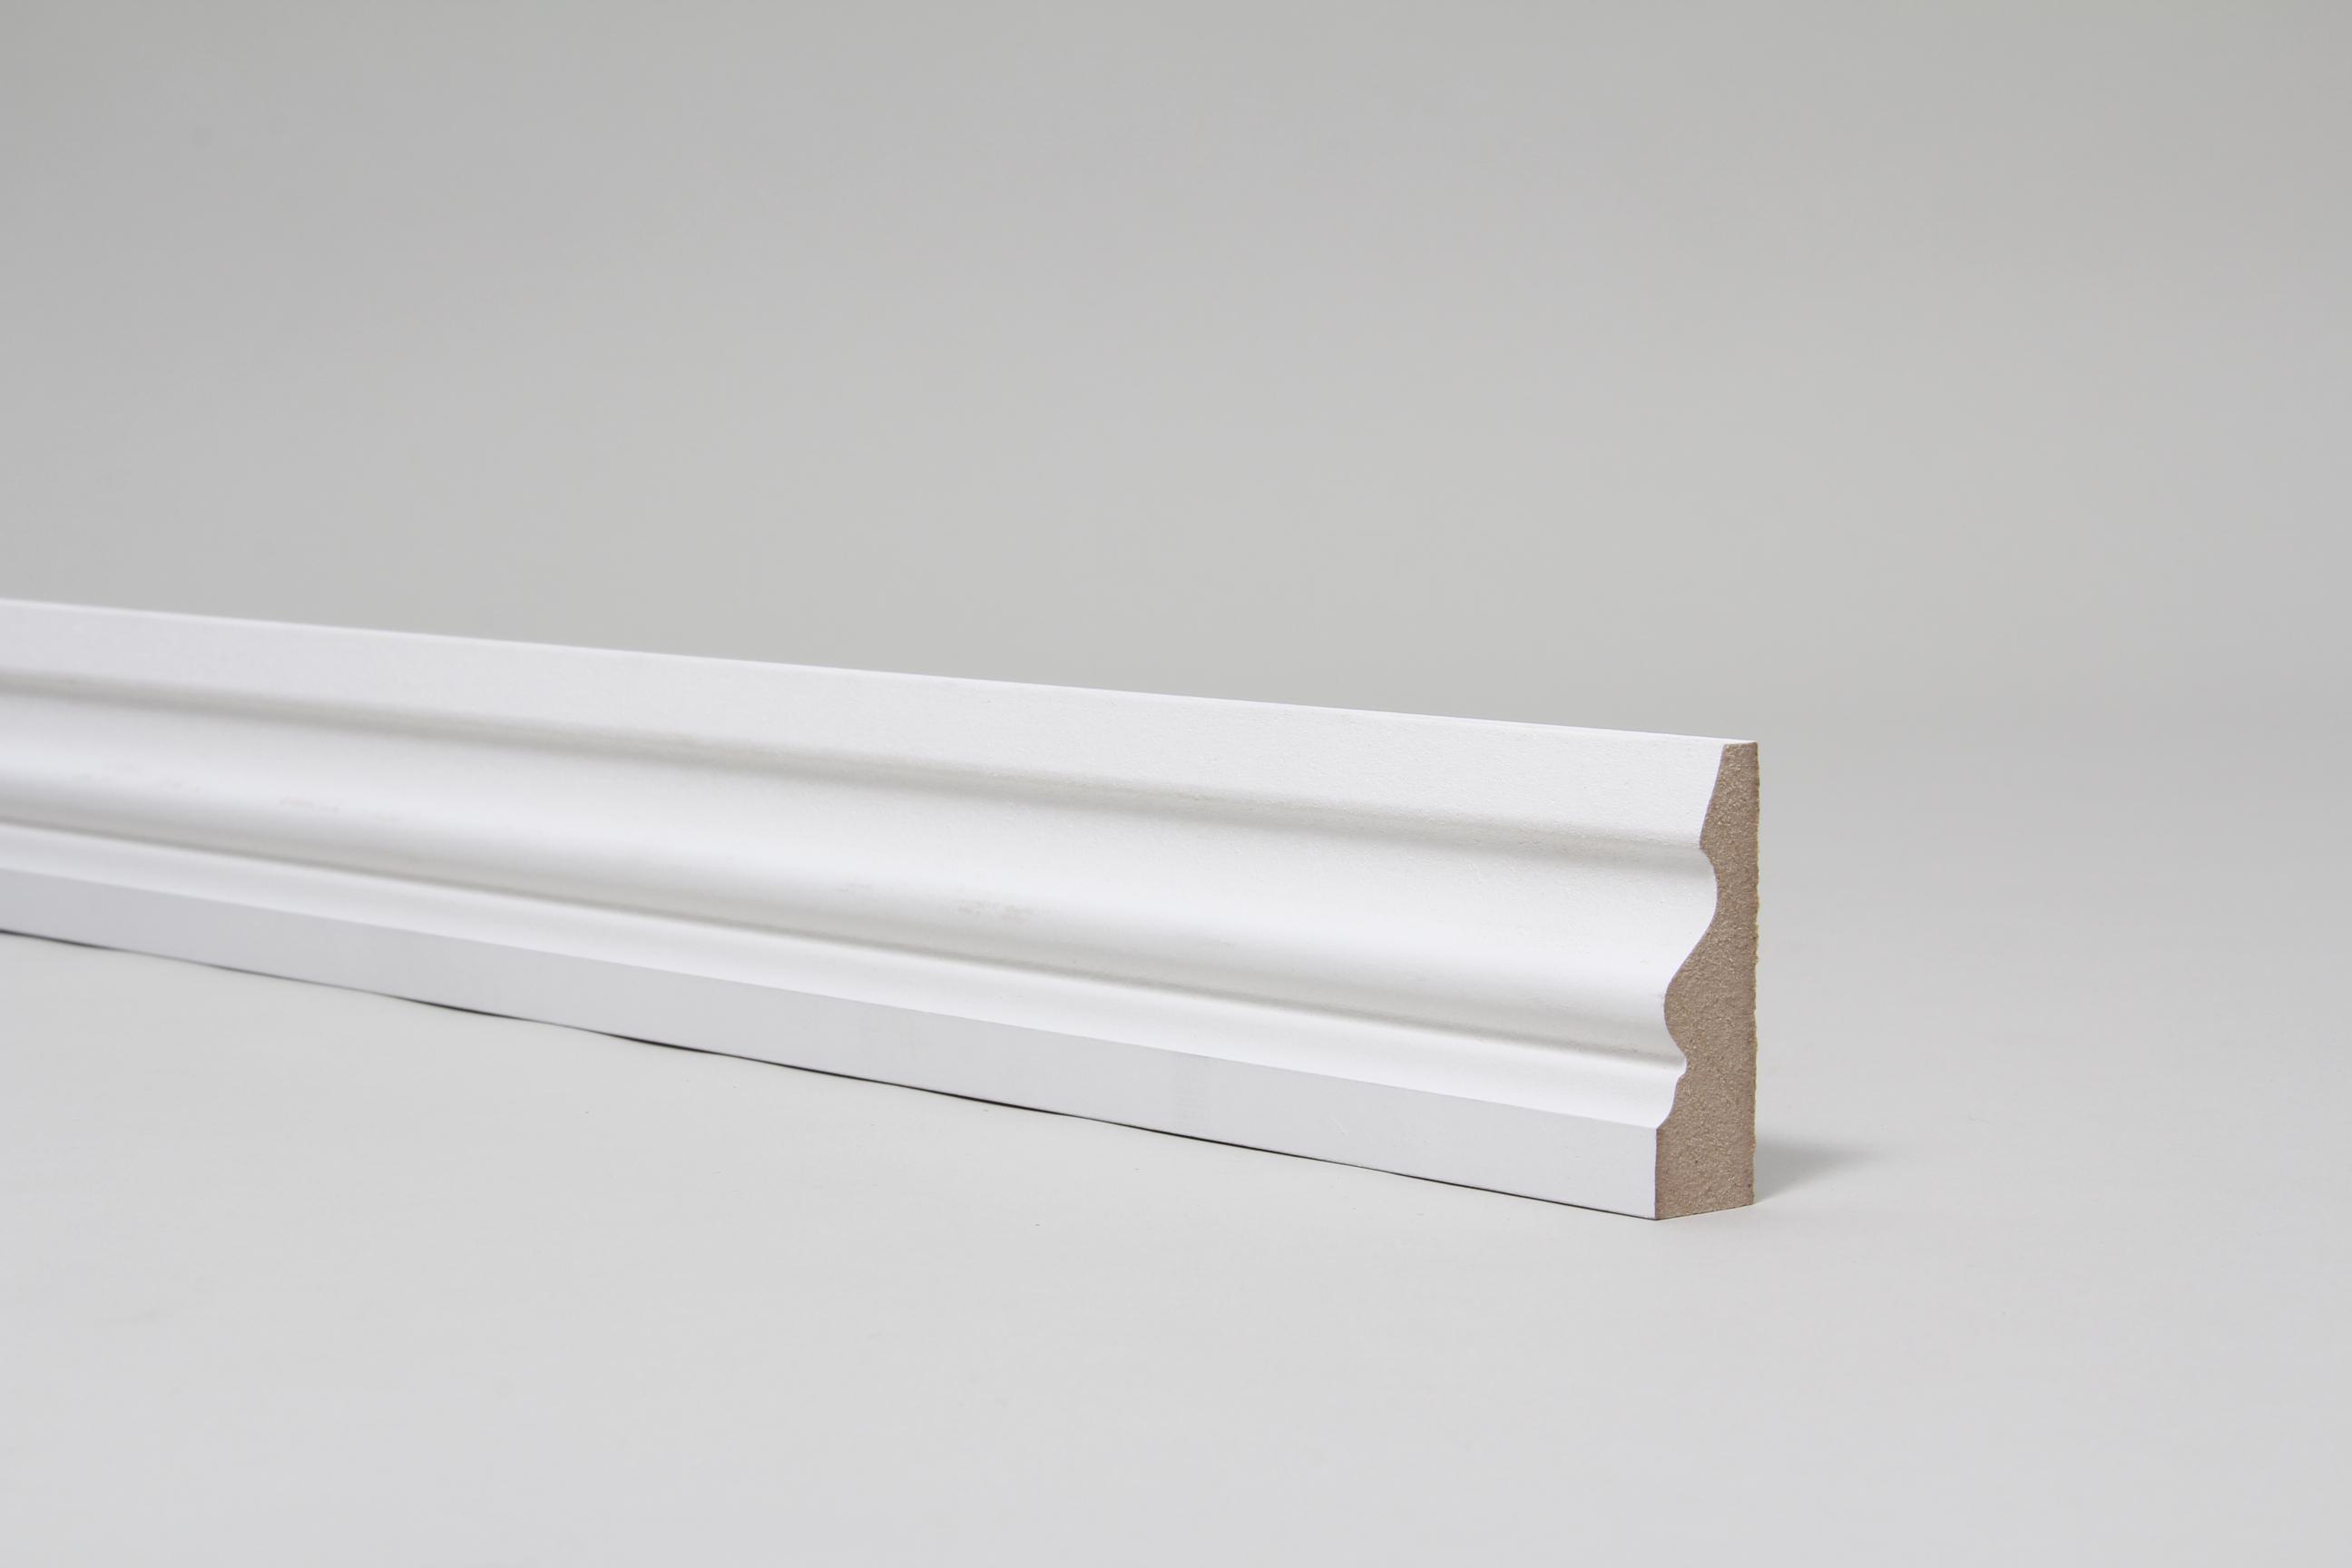 Ogee Pattern 4 18mm x 57mm Architrave Set Primed